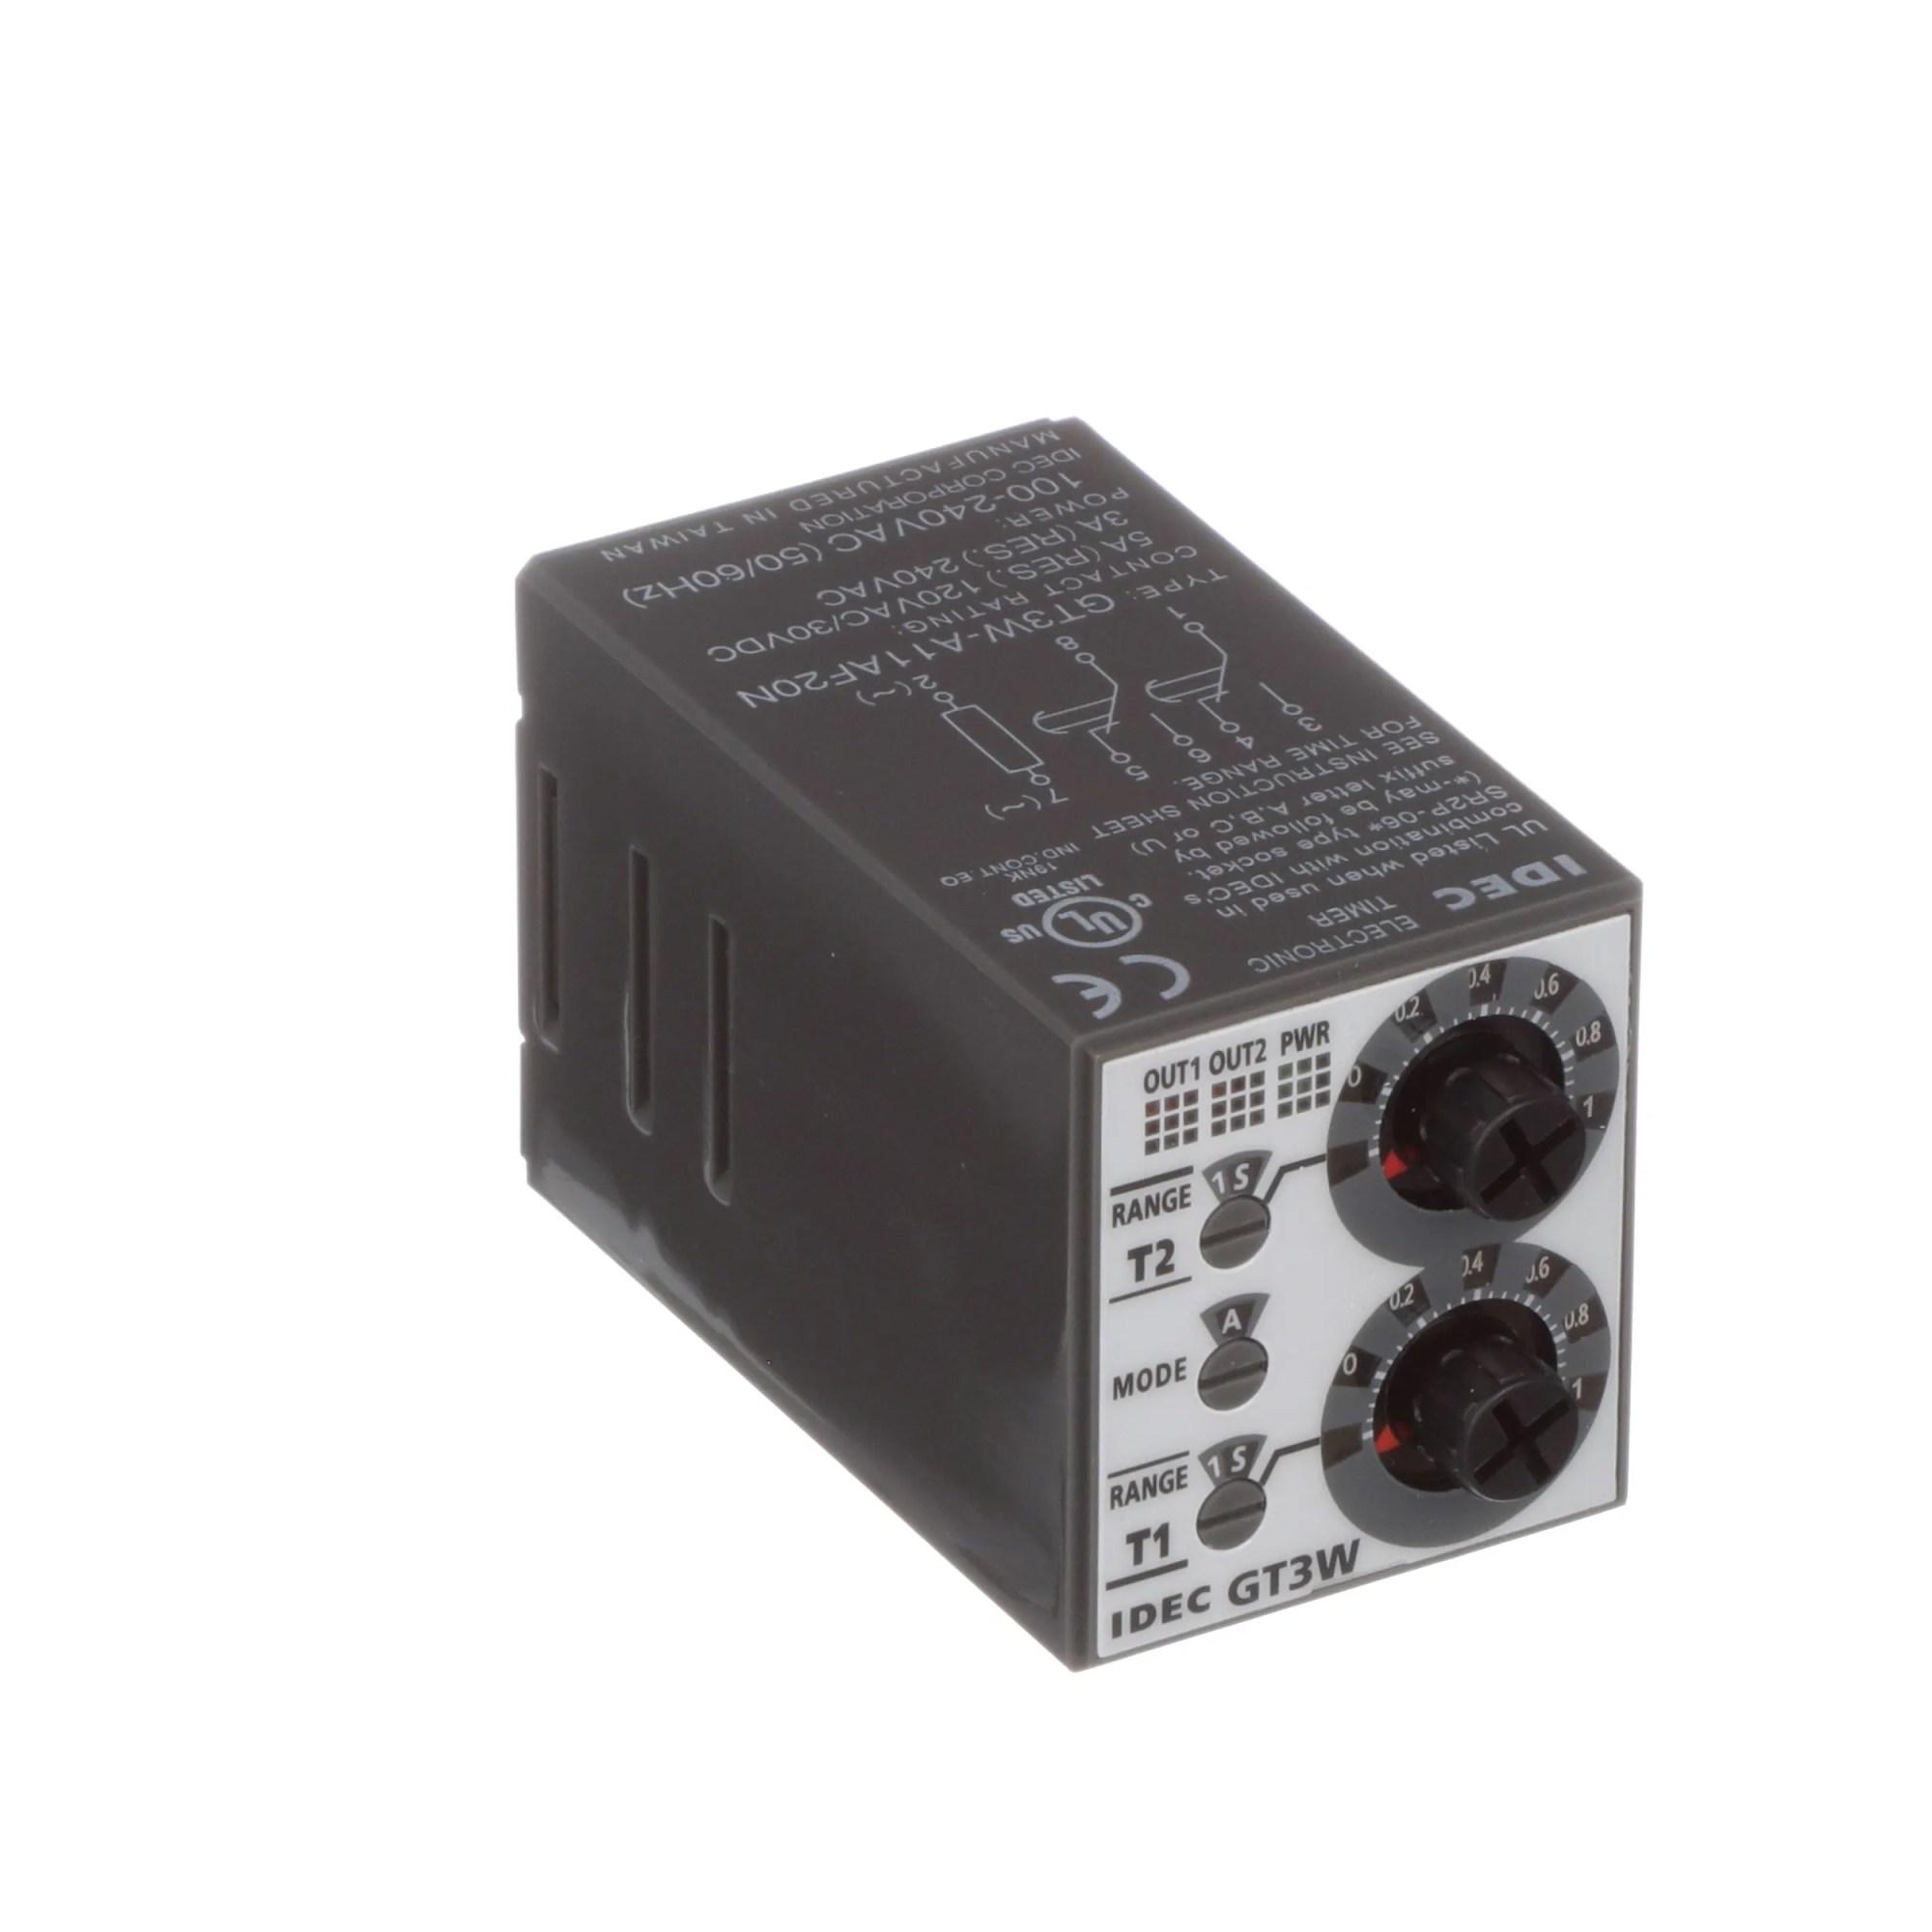 hight resolution of idec corporation gt3w a11af20n relay ssr timing multi function spdt cur rtg 5a ctrl v 100 240ac socket mnt allied electronics automation